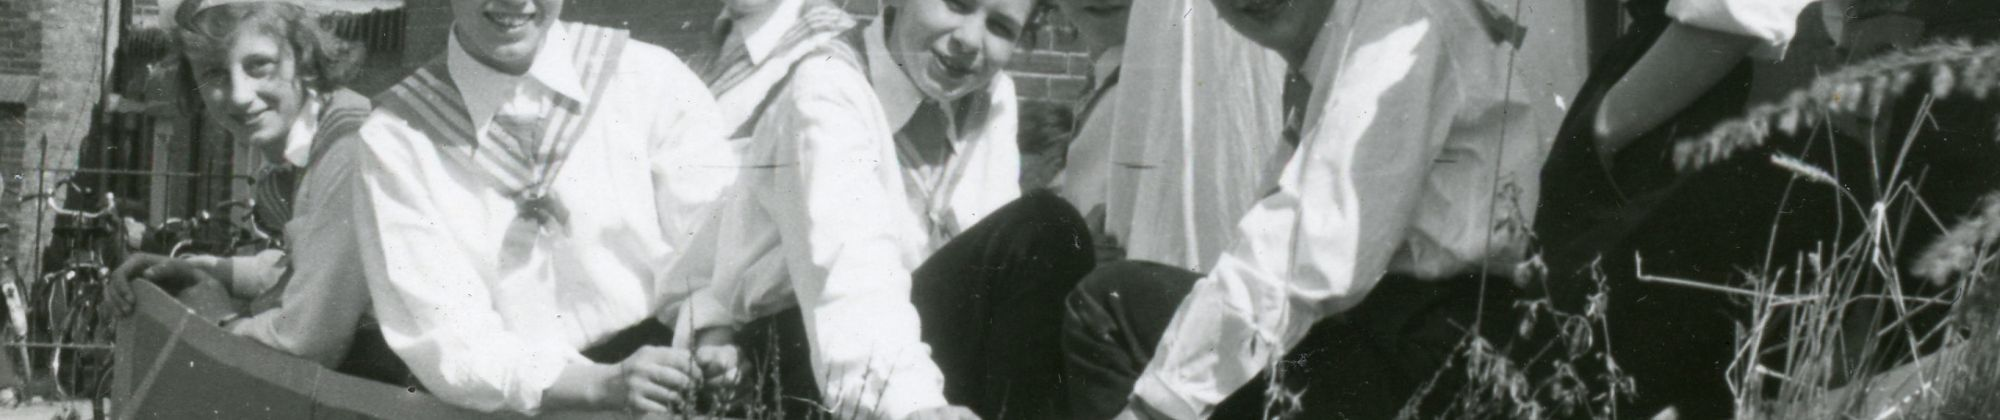 Bevrijdingsoptocht 1955